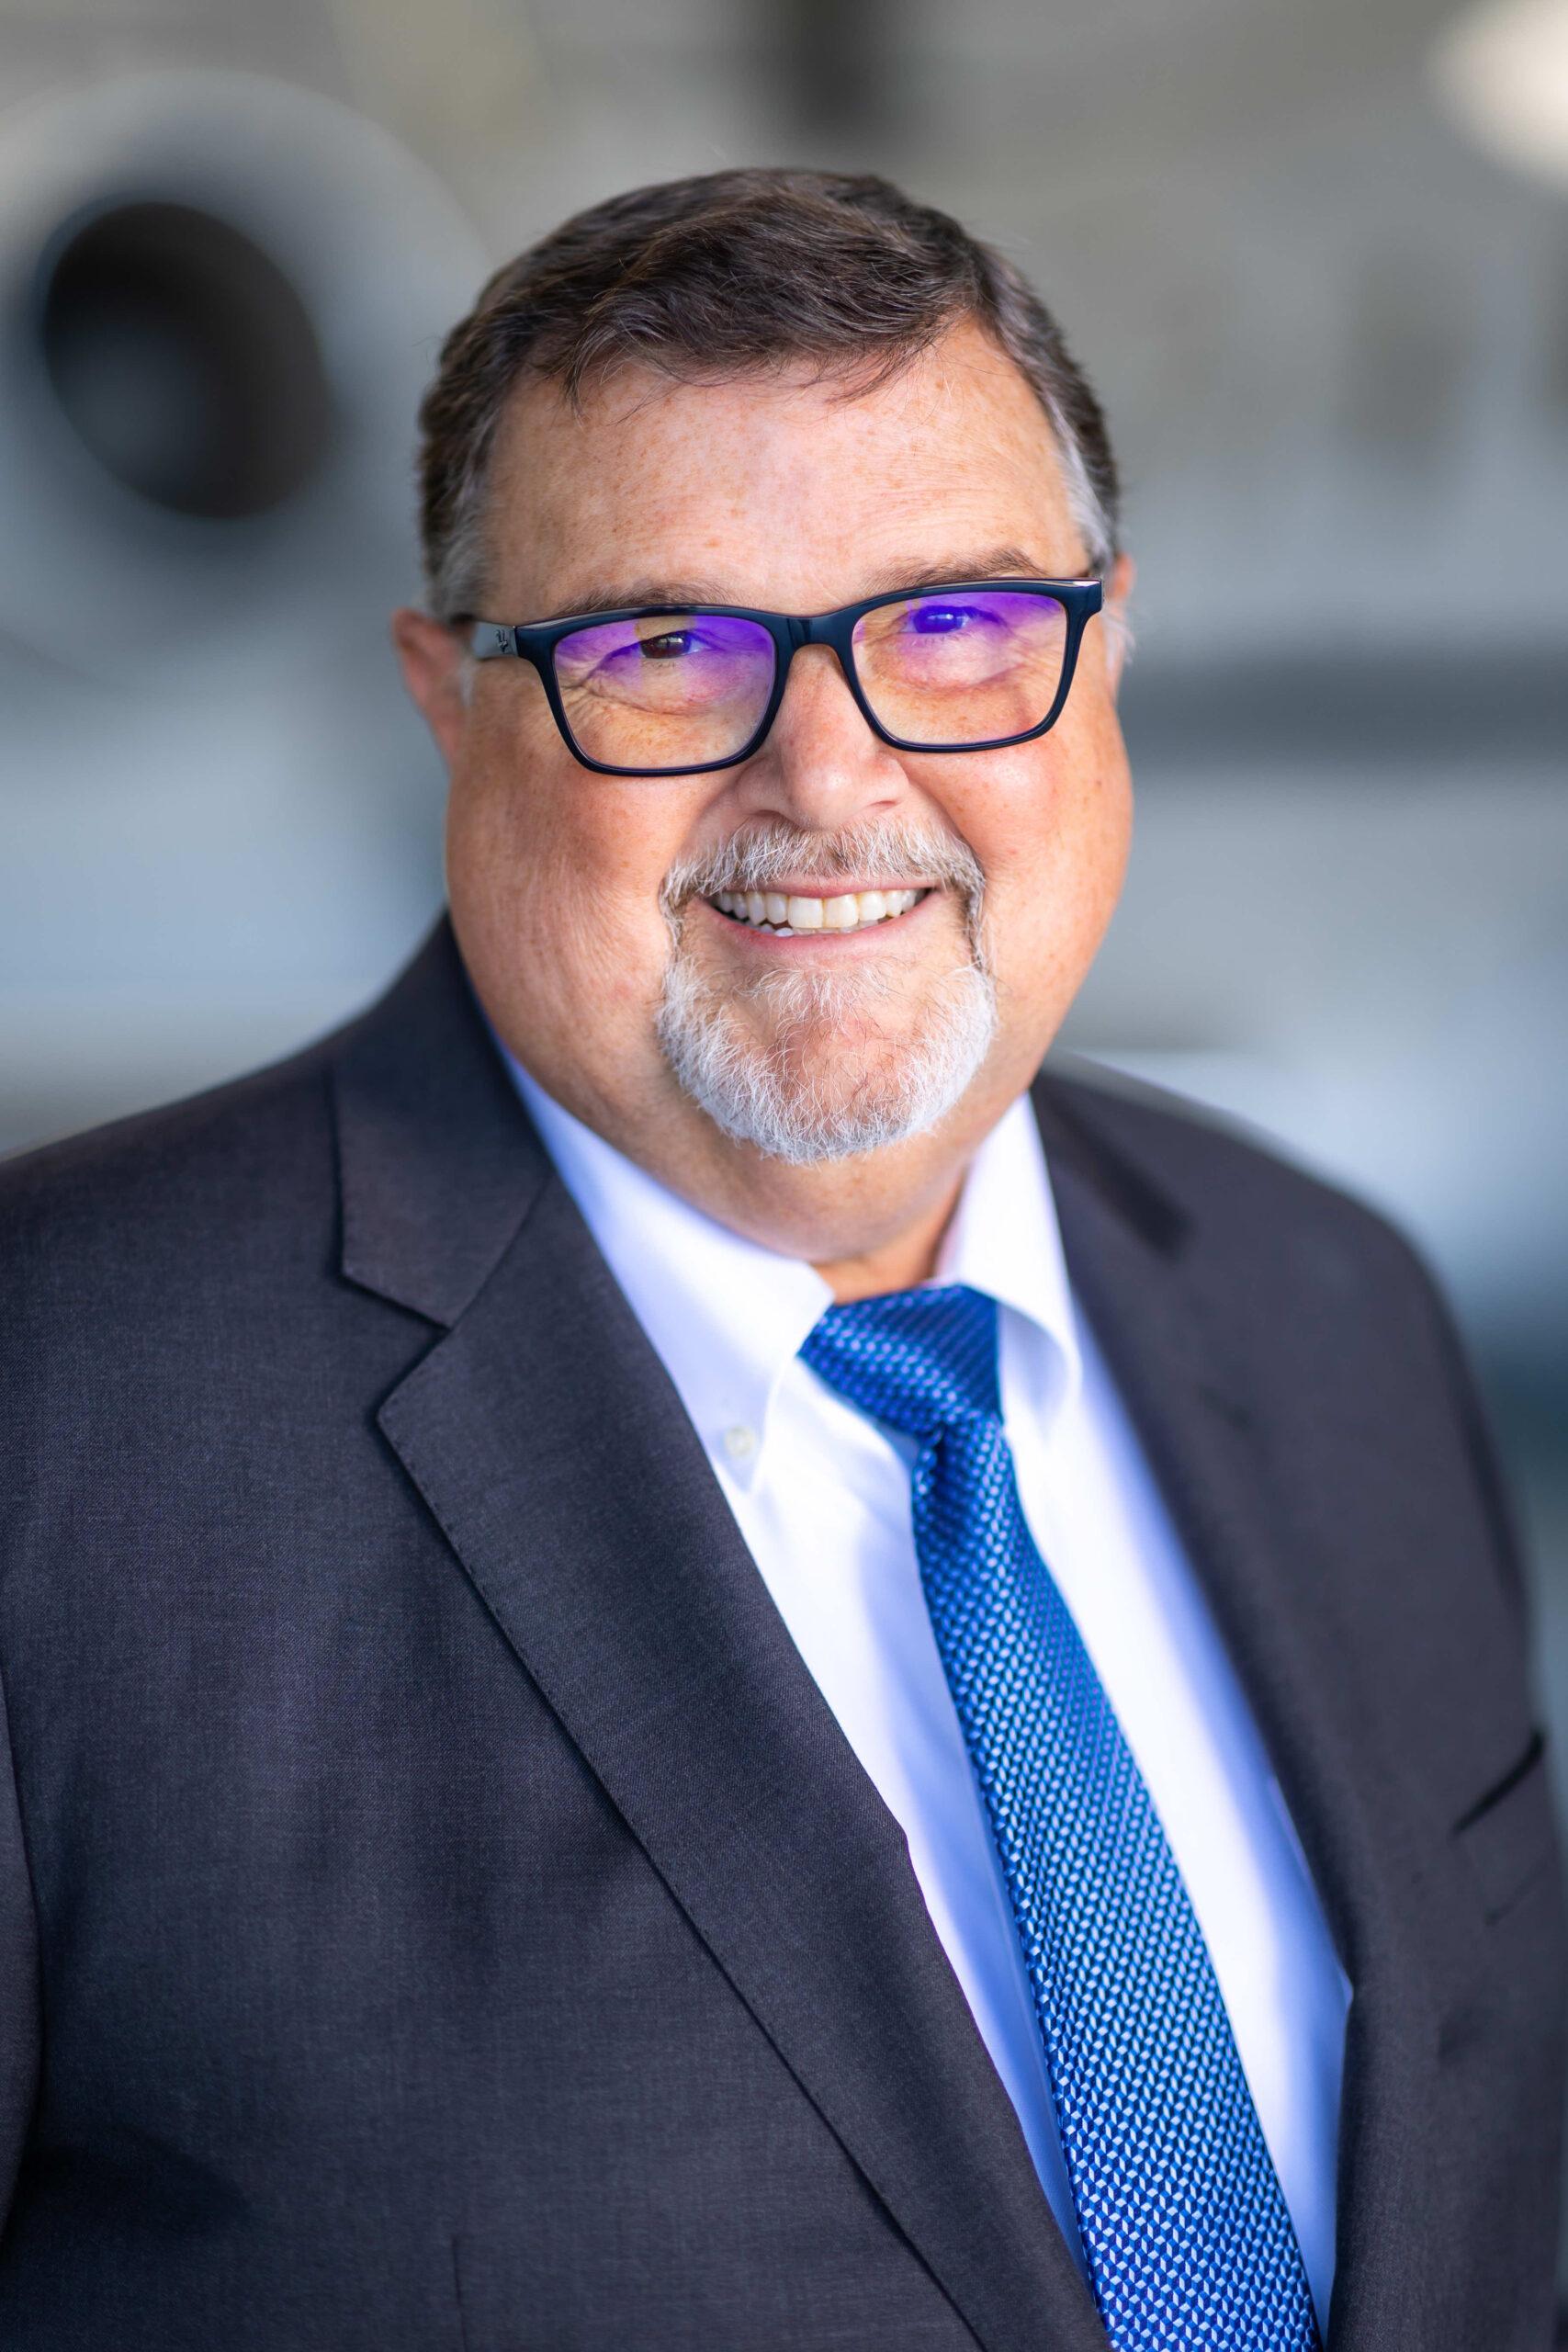 Randy DeLong